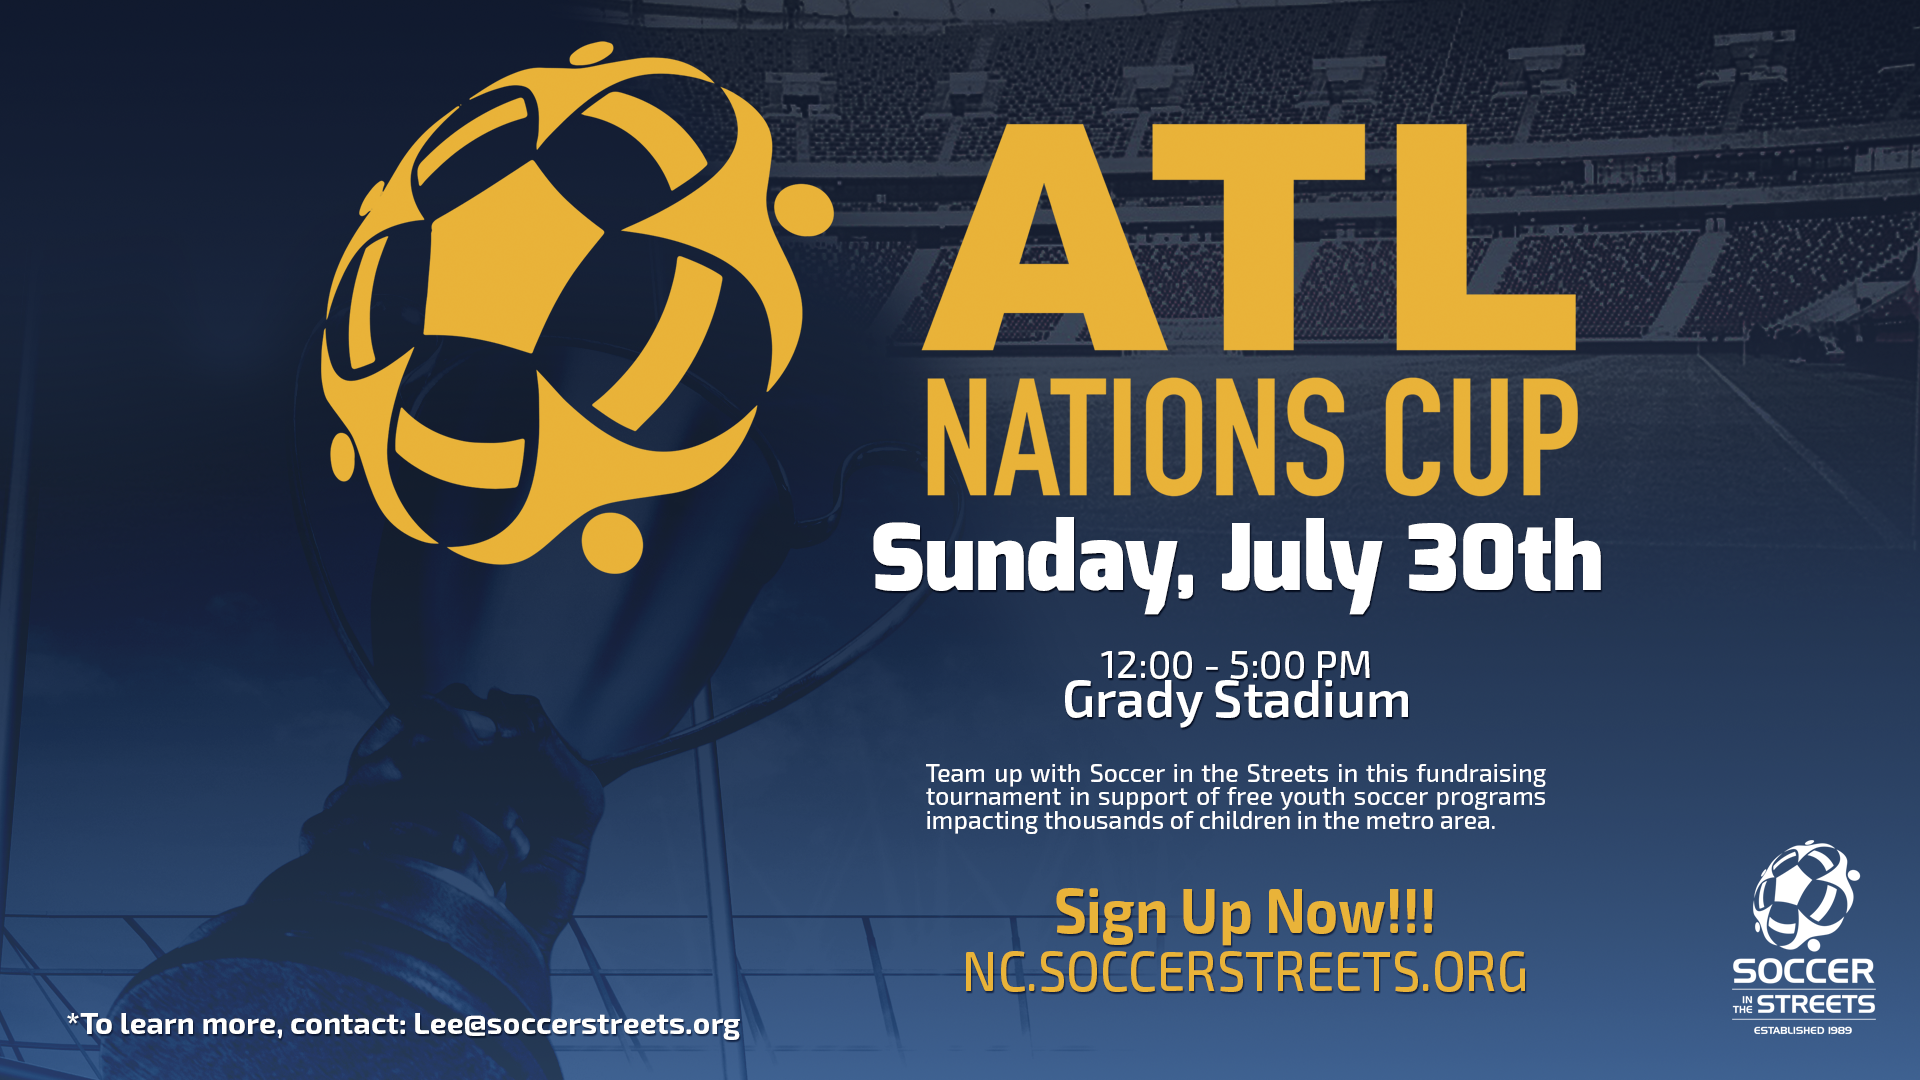 The Fundraiser tournament benefits thousands of underserved children in metro Atlanta